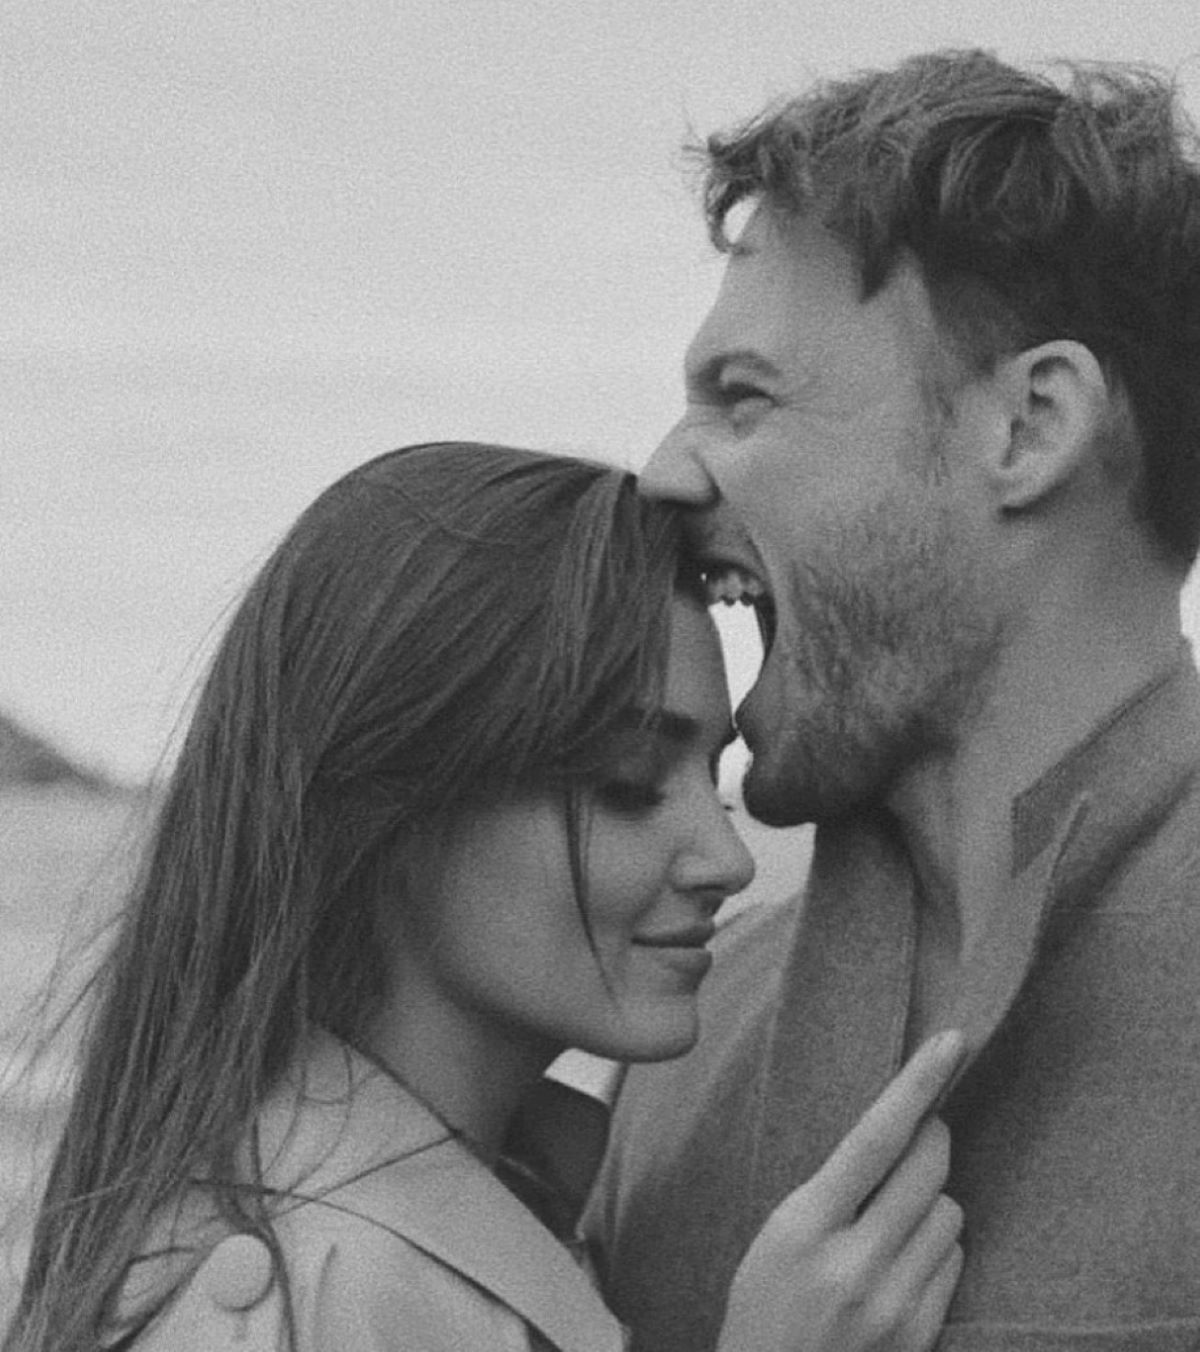 Hande Ercel  Kerem Bursin Fidanzati Love is in the Air